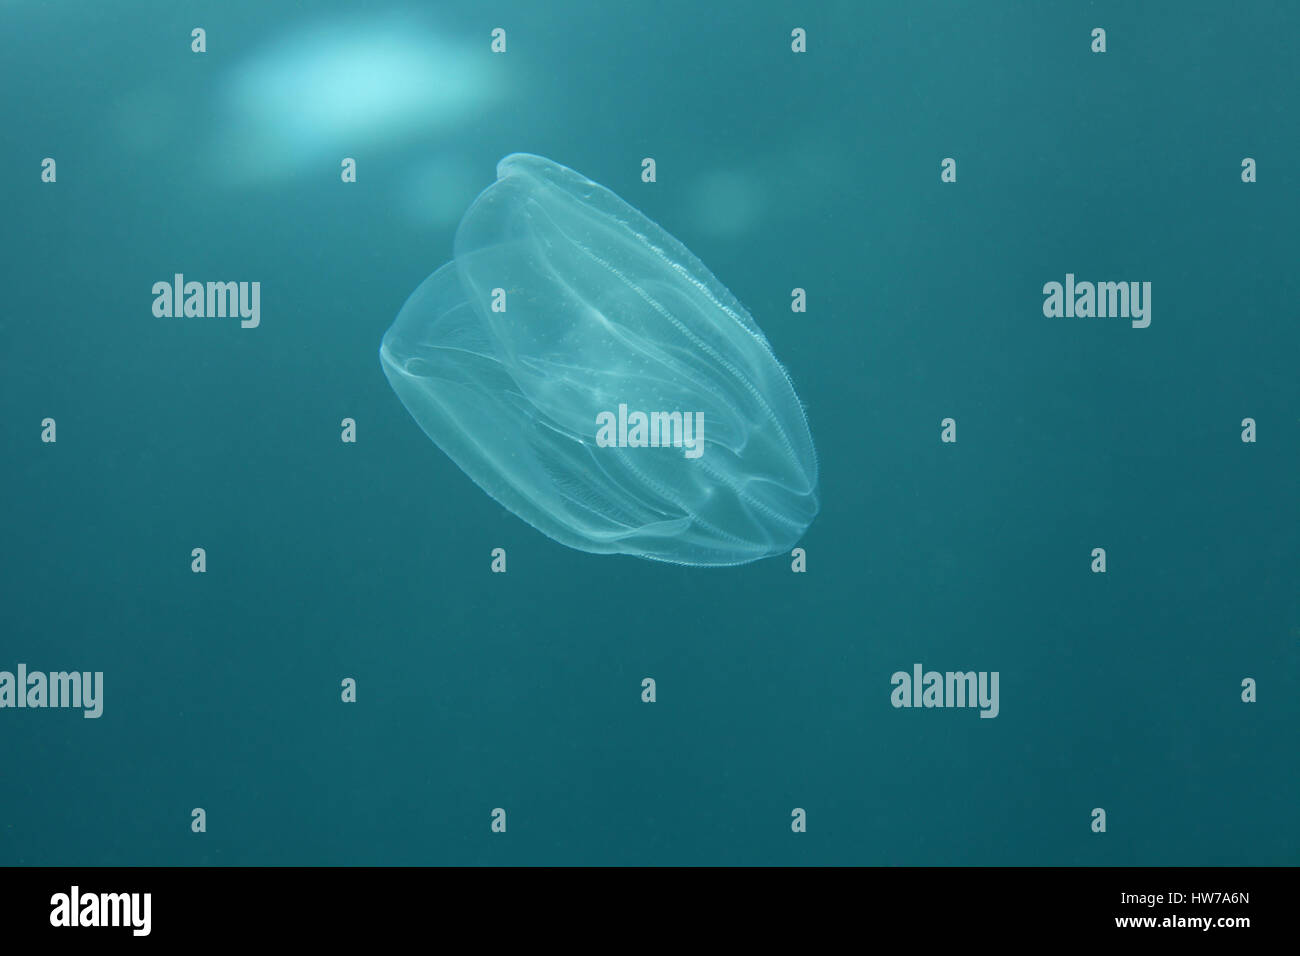 Sea walnut jellyfish (Mnemiopsis leidyi) underwater in the Mediterranean Sea Stock Photo